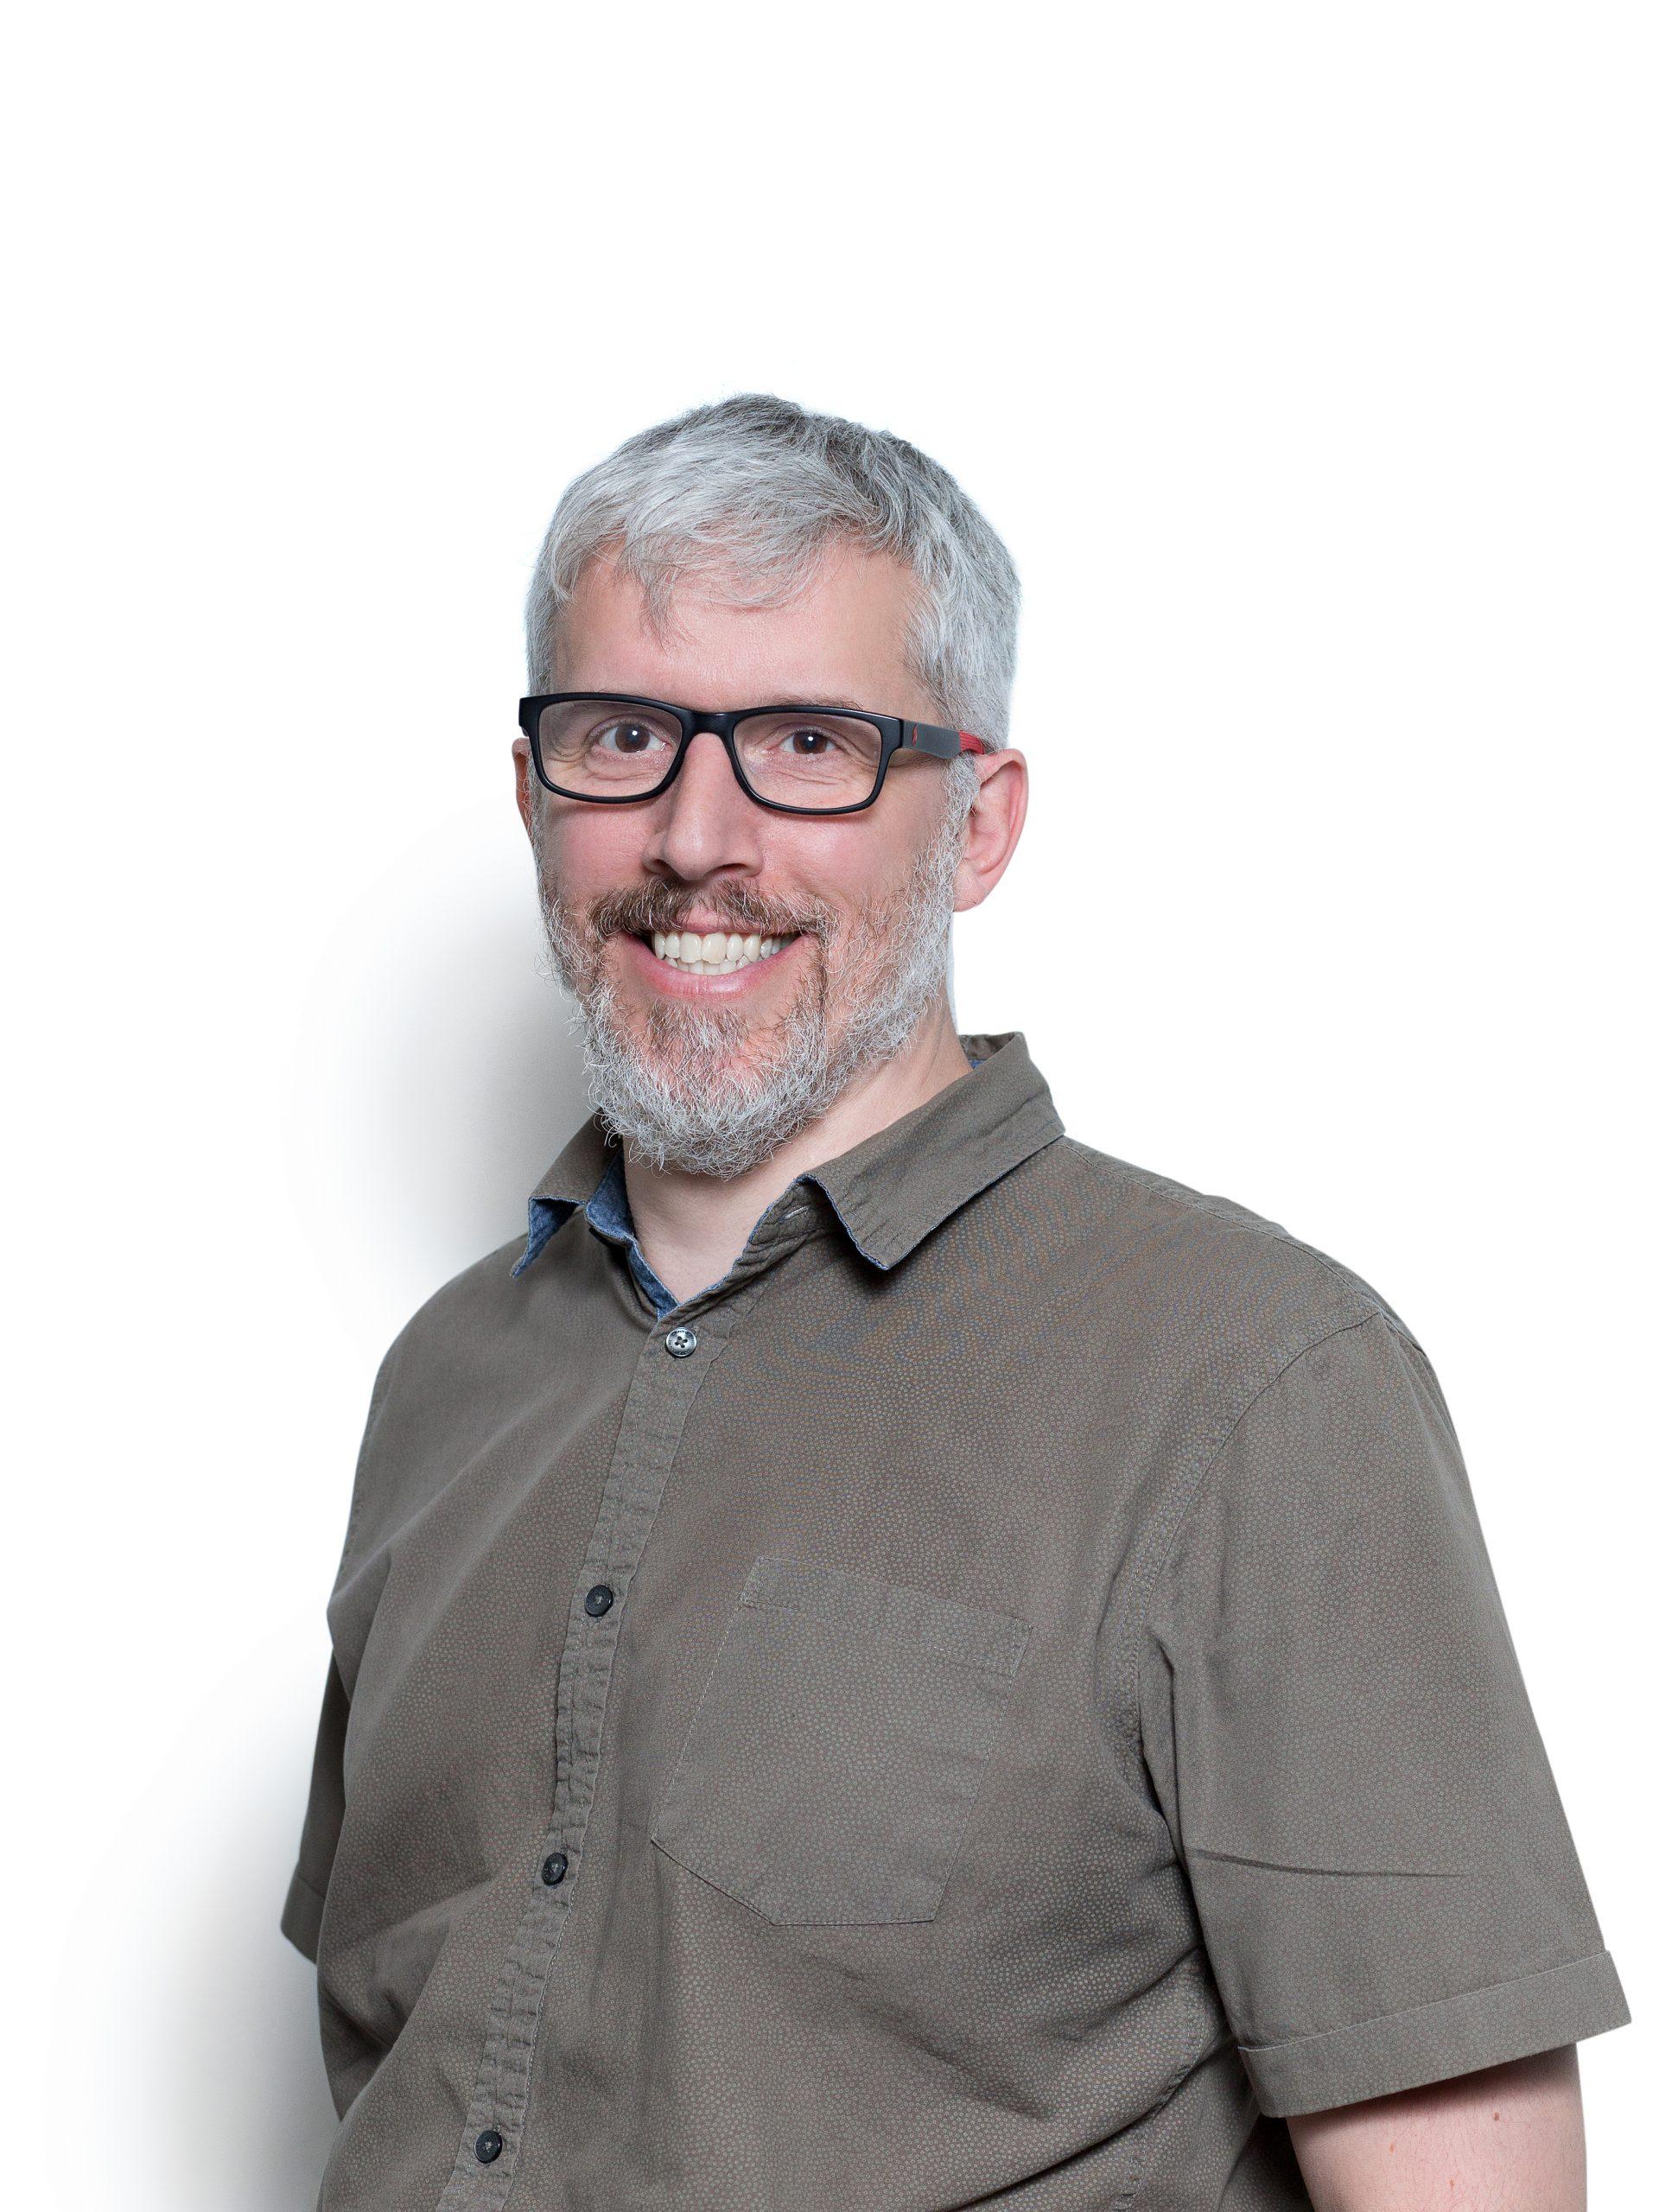 Jeffrey Muir